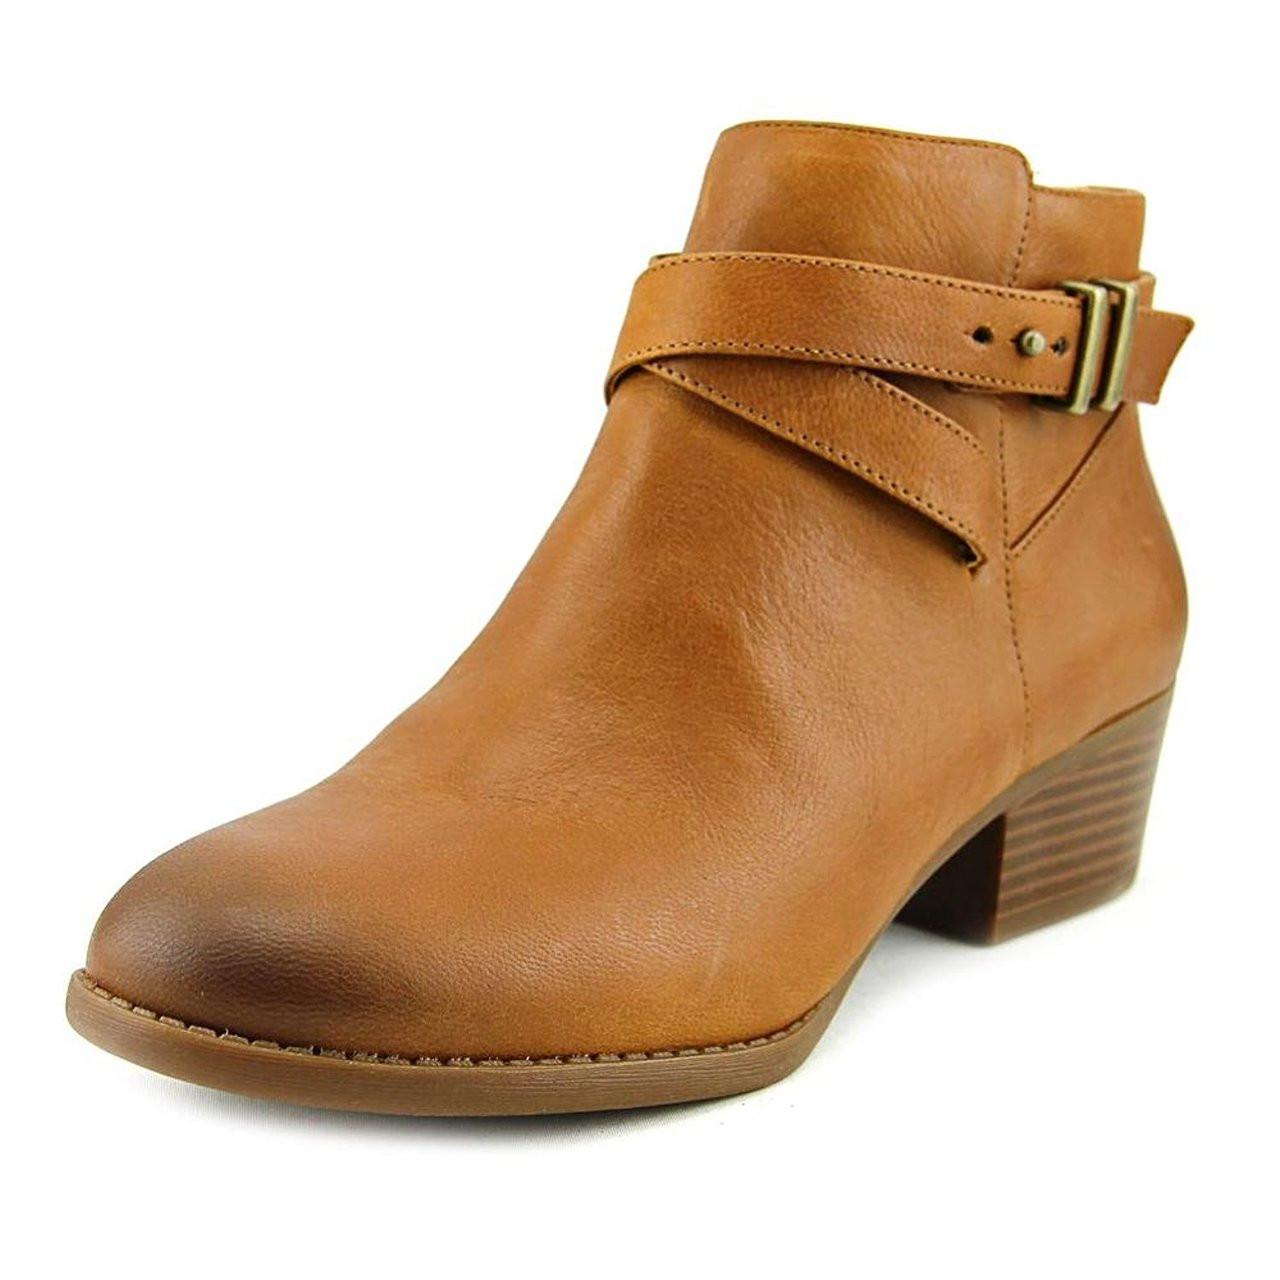 5e2d83e843b1 ... INC International Concepts Womens Herbii Closed Toe Ankle Fashion Boots~pp-2f36fec0  ...